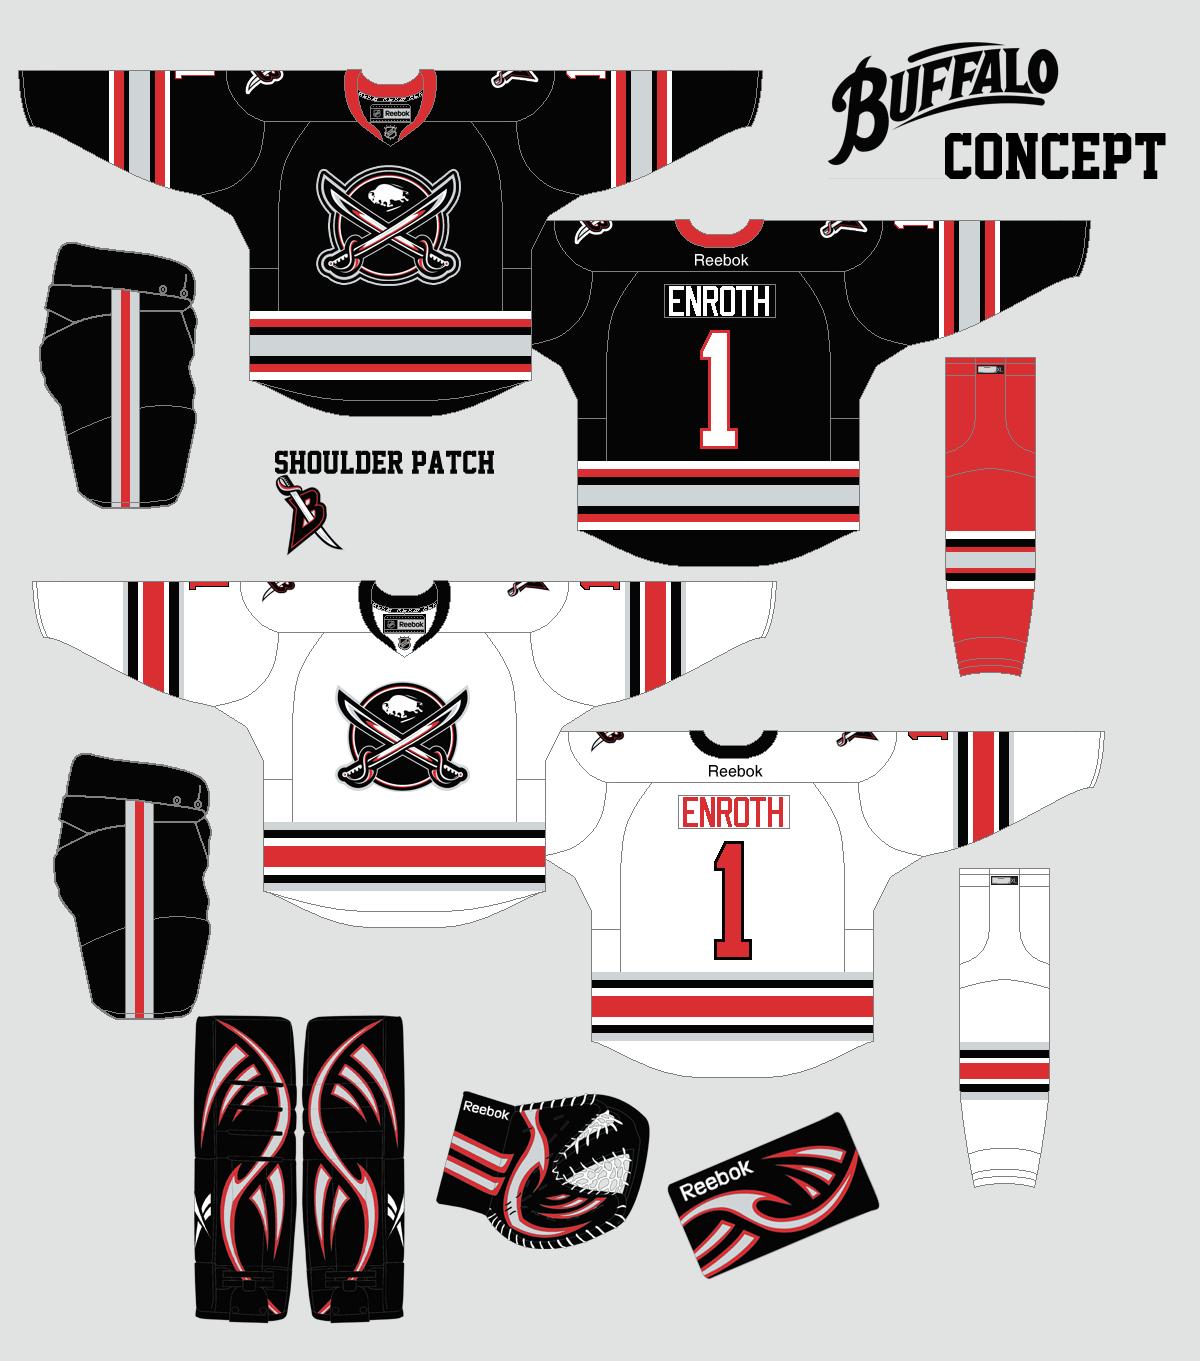 cheaper c96e9 c40ea The Concept Corner: NHL: Bringing Back the Black and Red